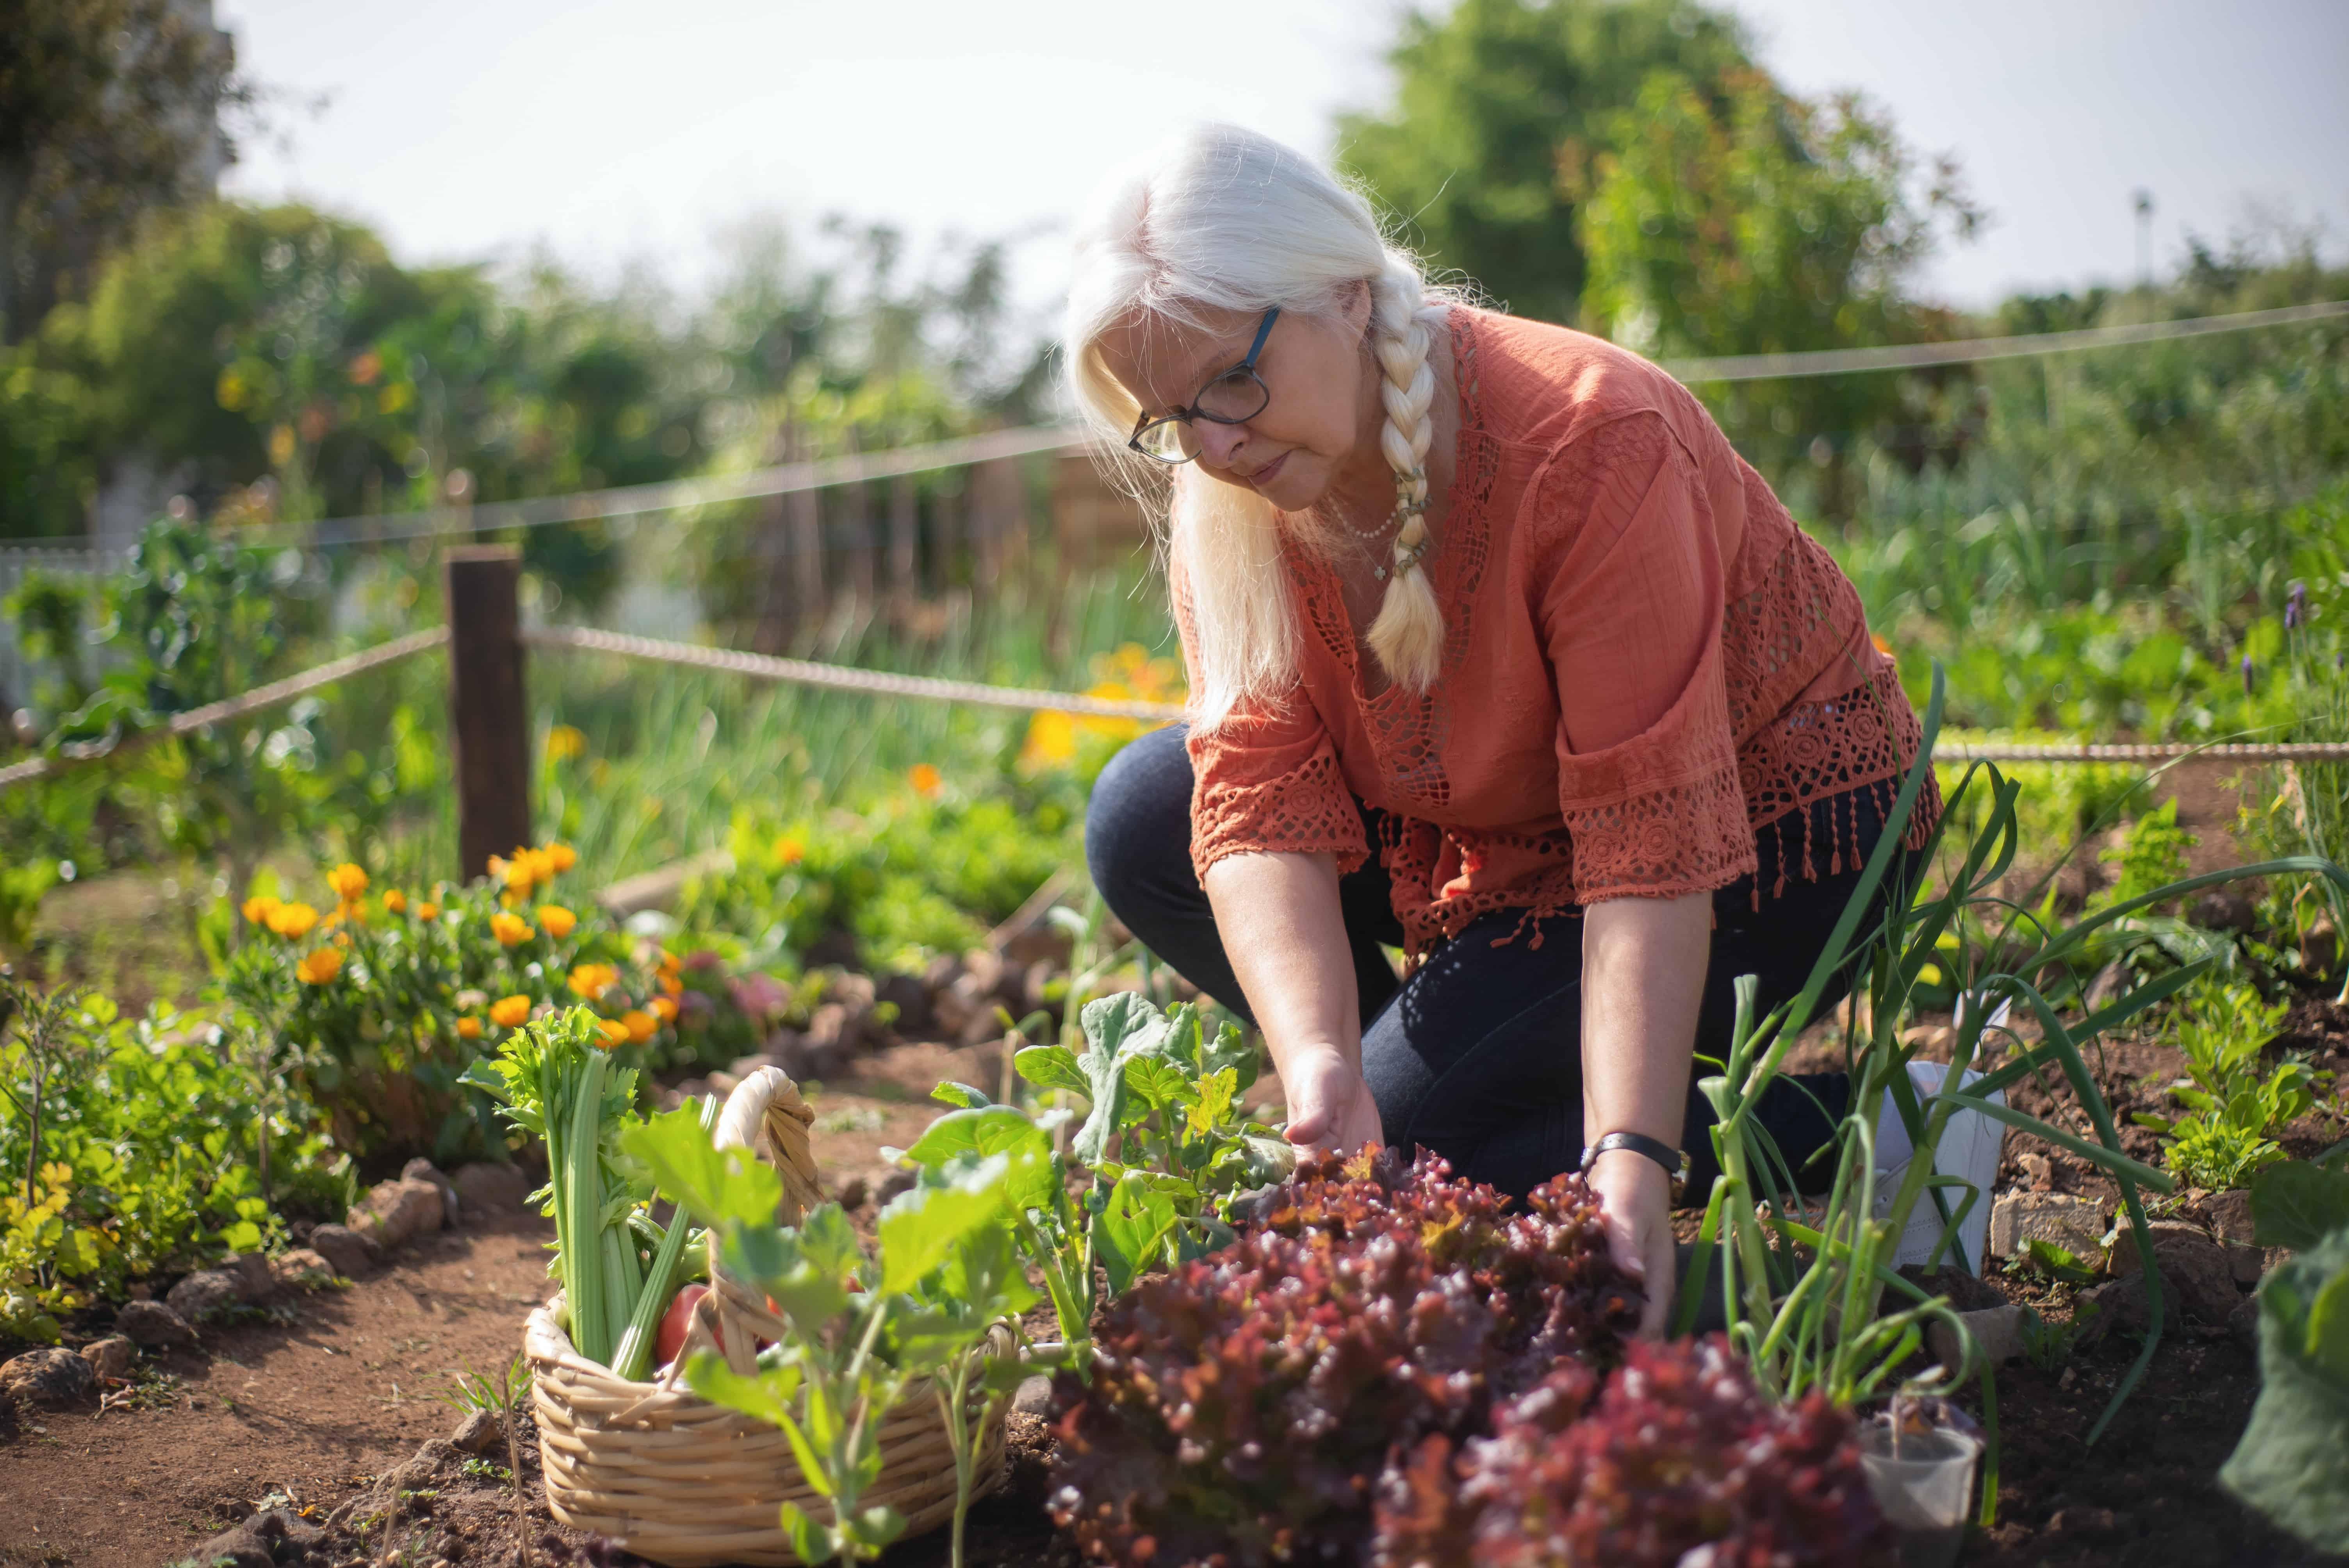 Best Drip Irrigation System for a Vegetable Garden